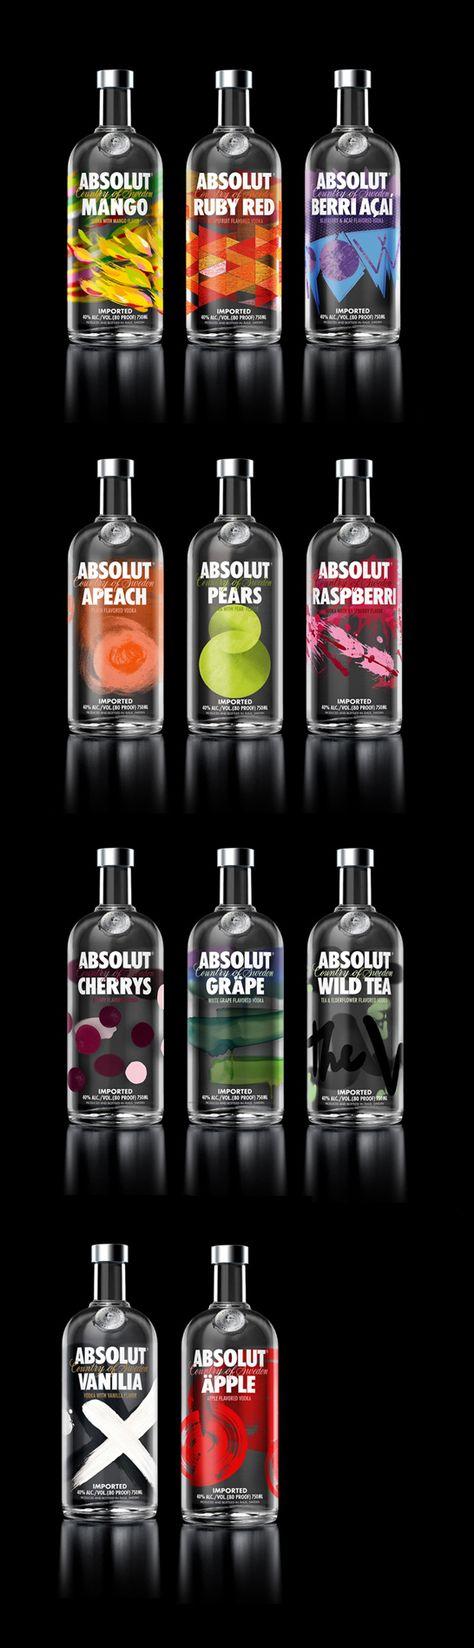 {Absolut} New Absolut Vodka designs - 2013 #Absolut #vodka